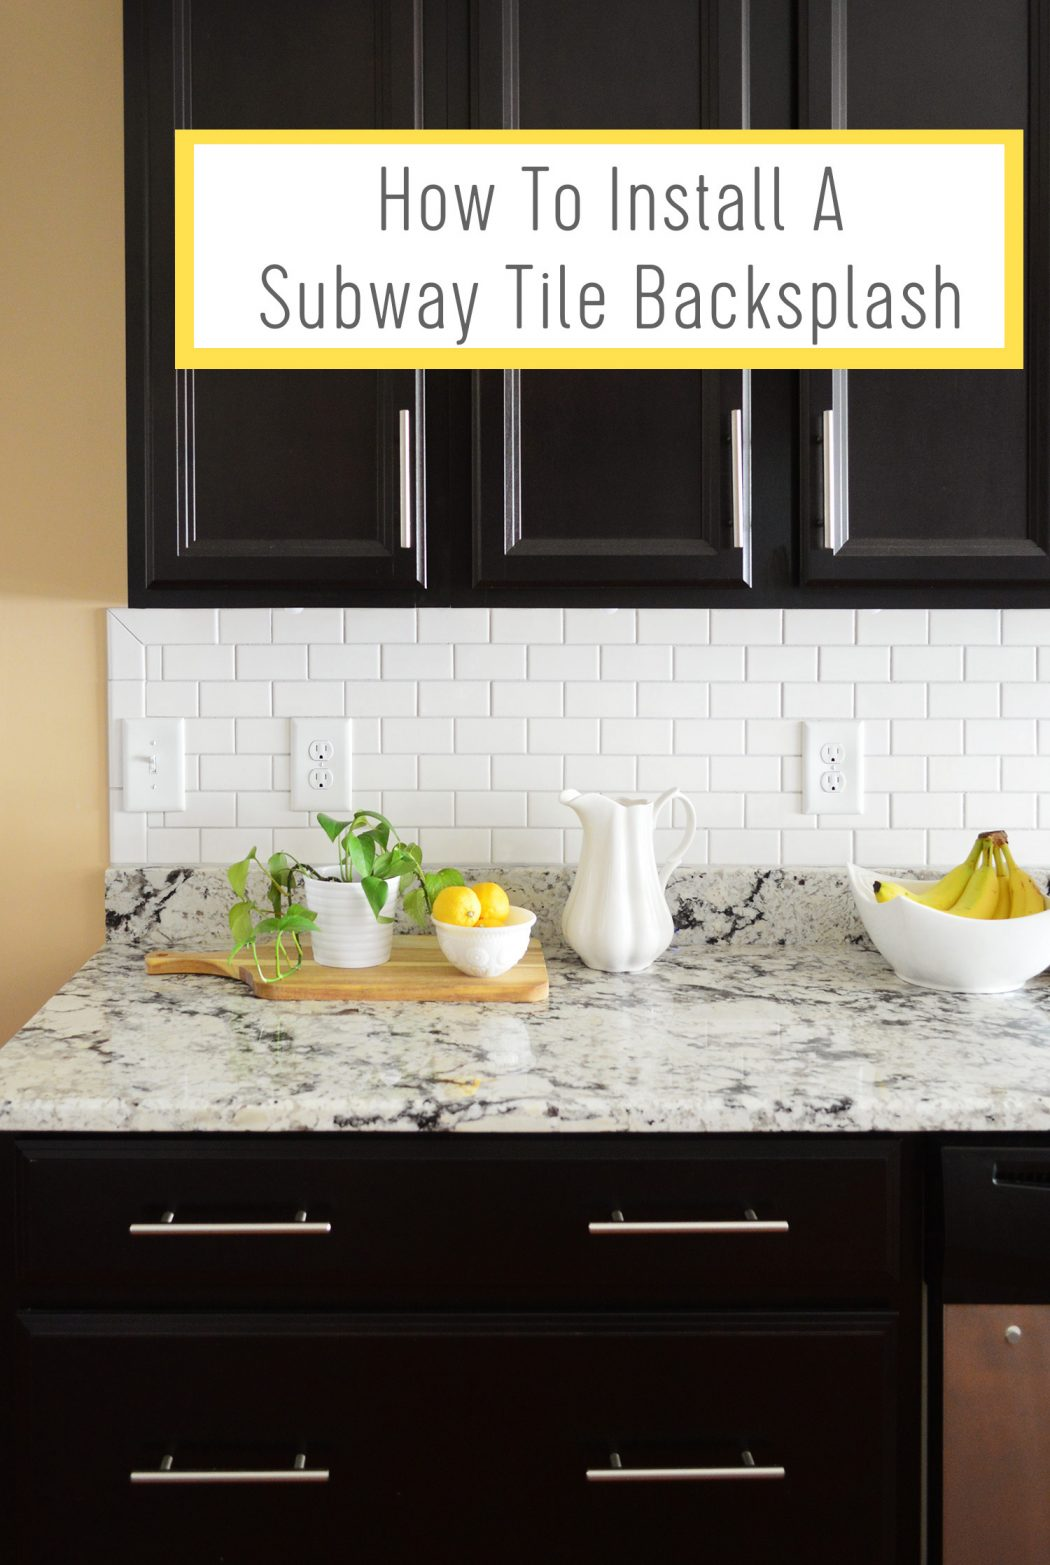 How to install a subway tile kitchen backsplash young house love how to install a subway tile kitchen backsplash dailygadgetfo Choice Image